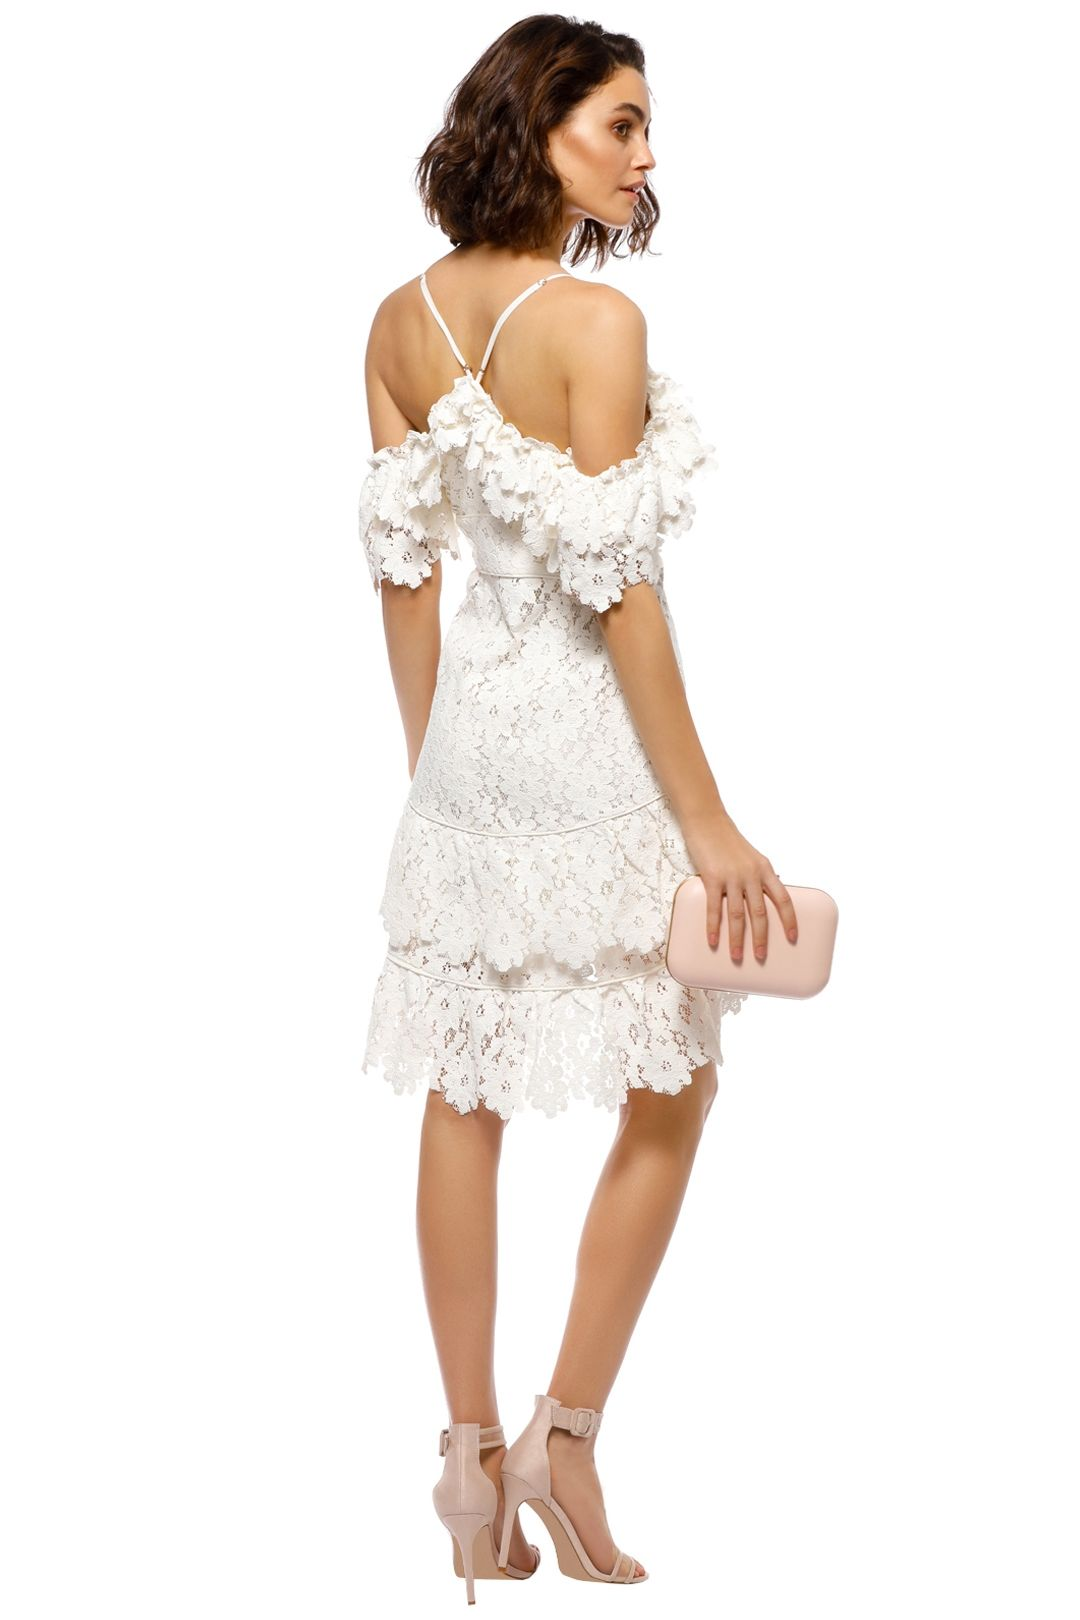 Saylor - Dana Dress - White - Back